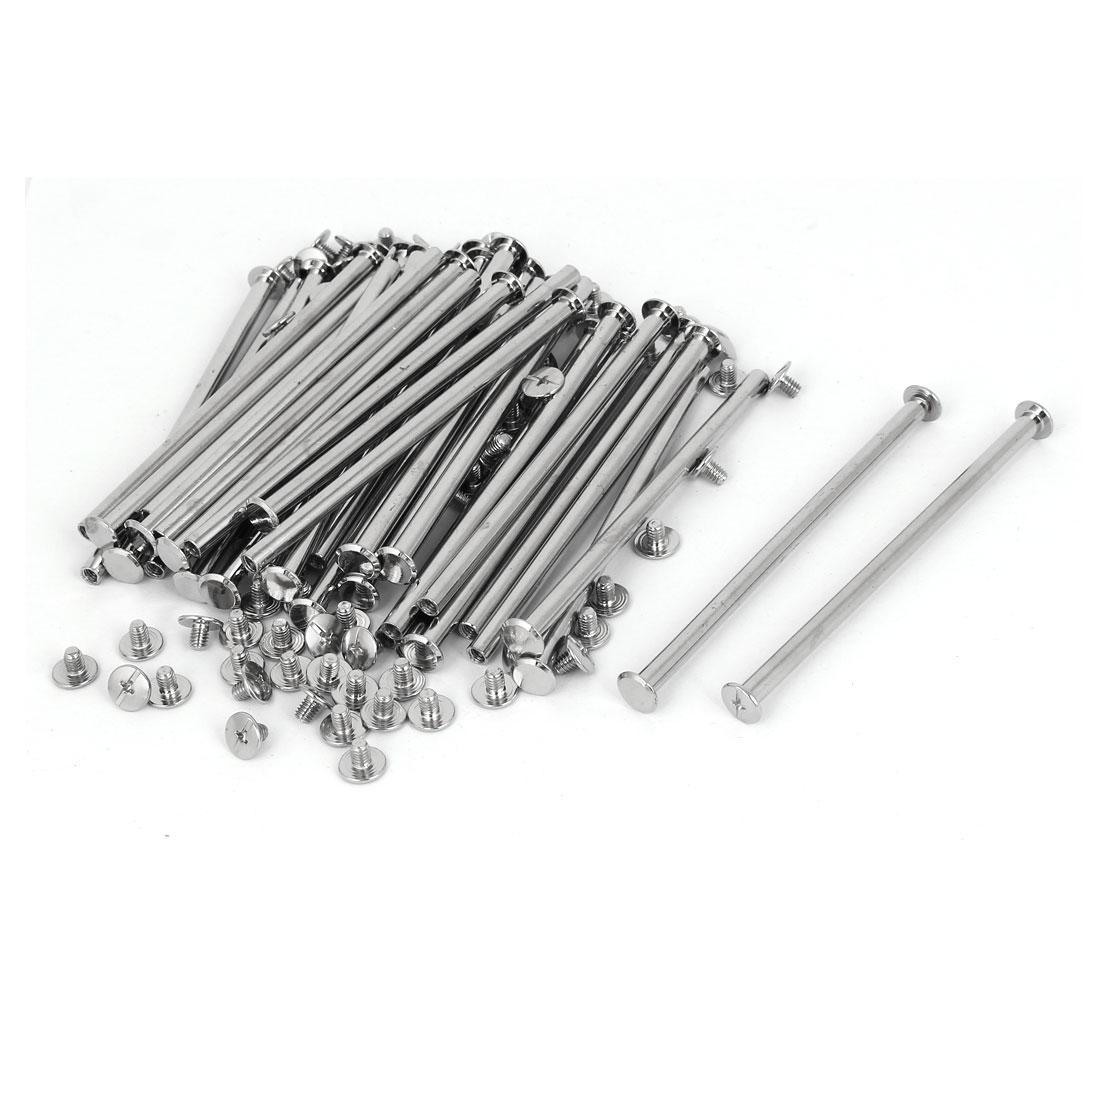 M5 x 100mm Photo Albums Aluminum Binding Screw Post Silver Tone 30pcs